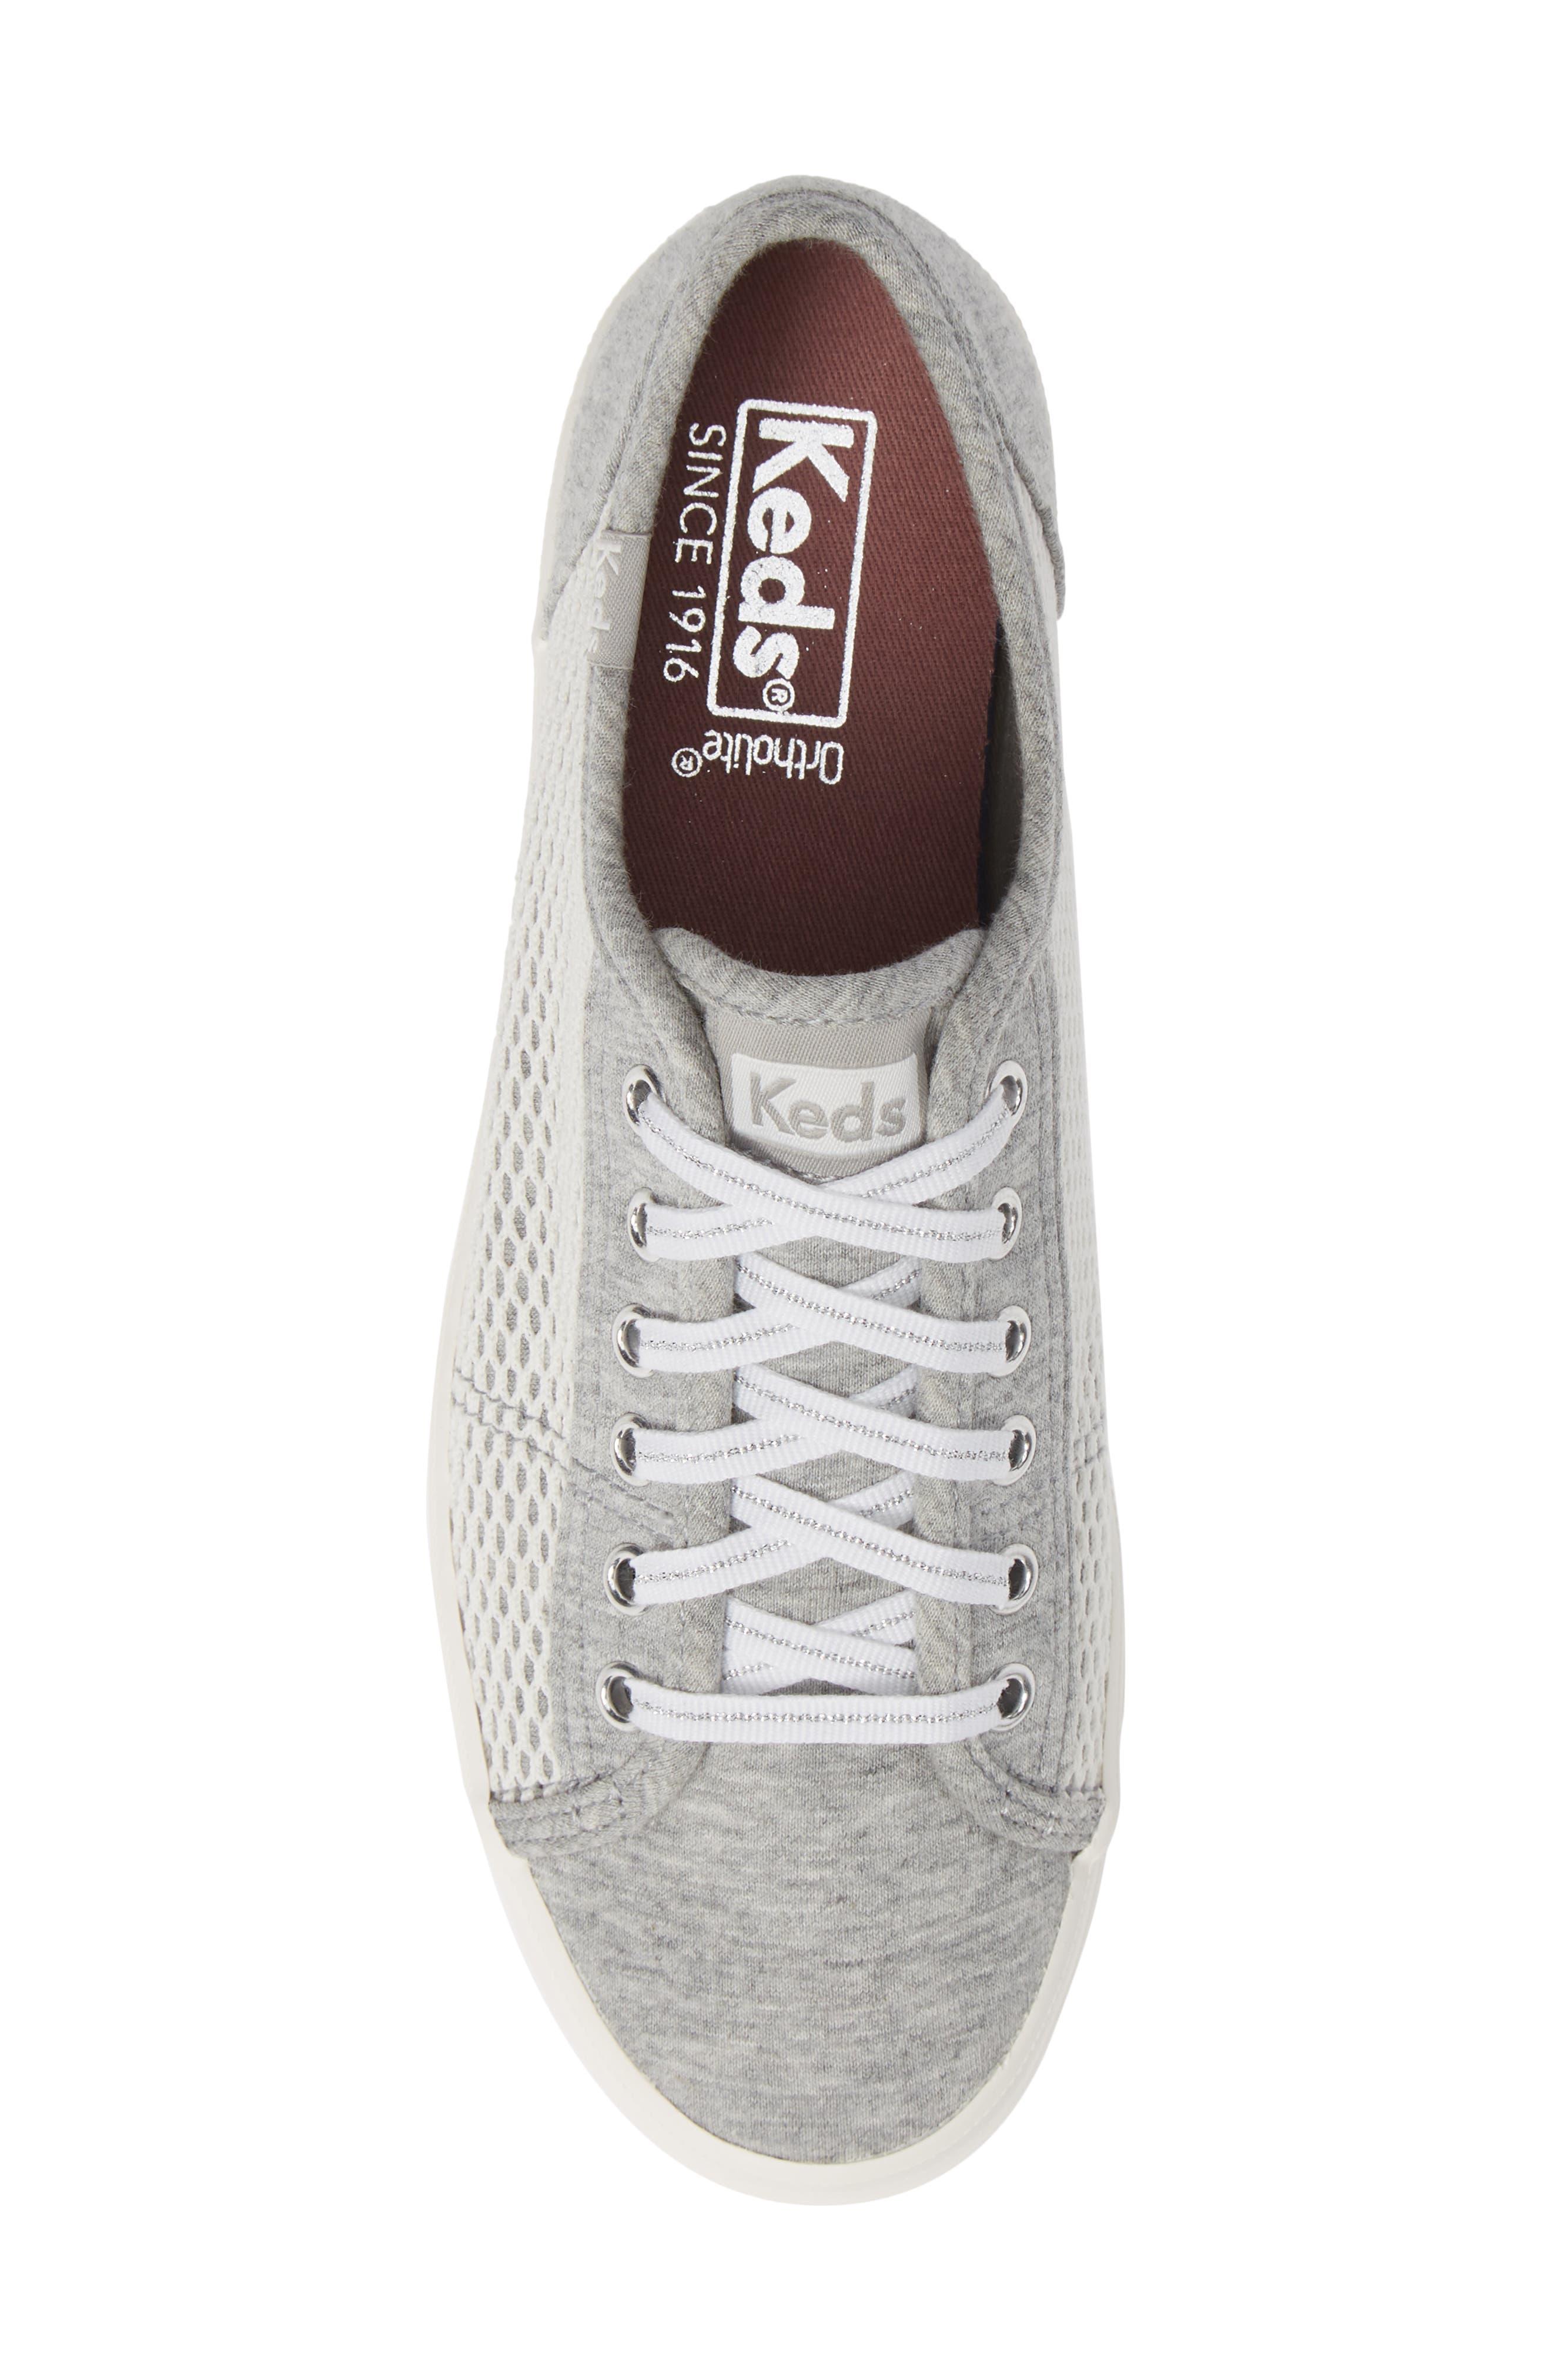 KEDS<SUP>®</SUP>, Kickstart Mesh & Jersey Sneaker, Alternate thumbnail 5, color, LIGHT GRAY